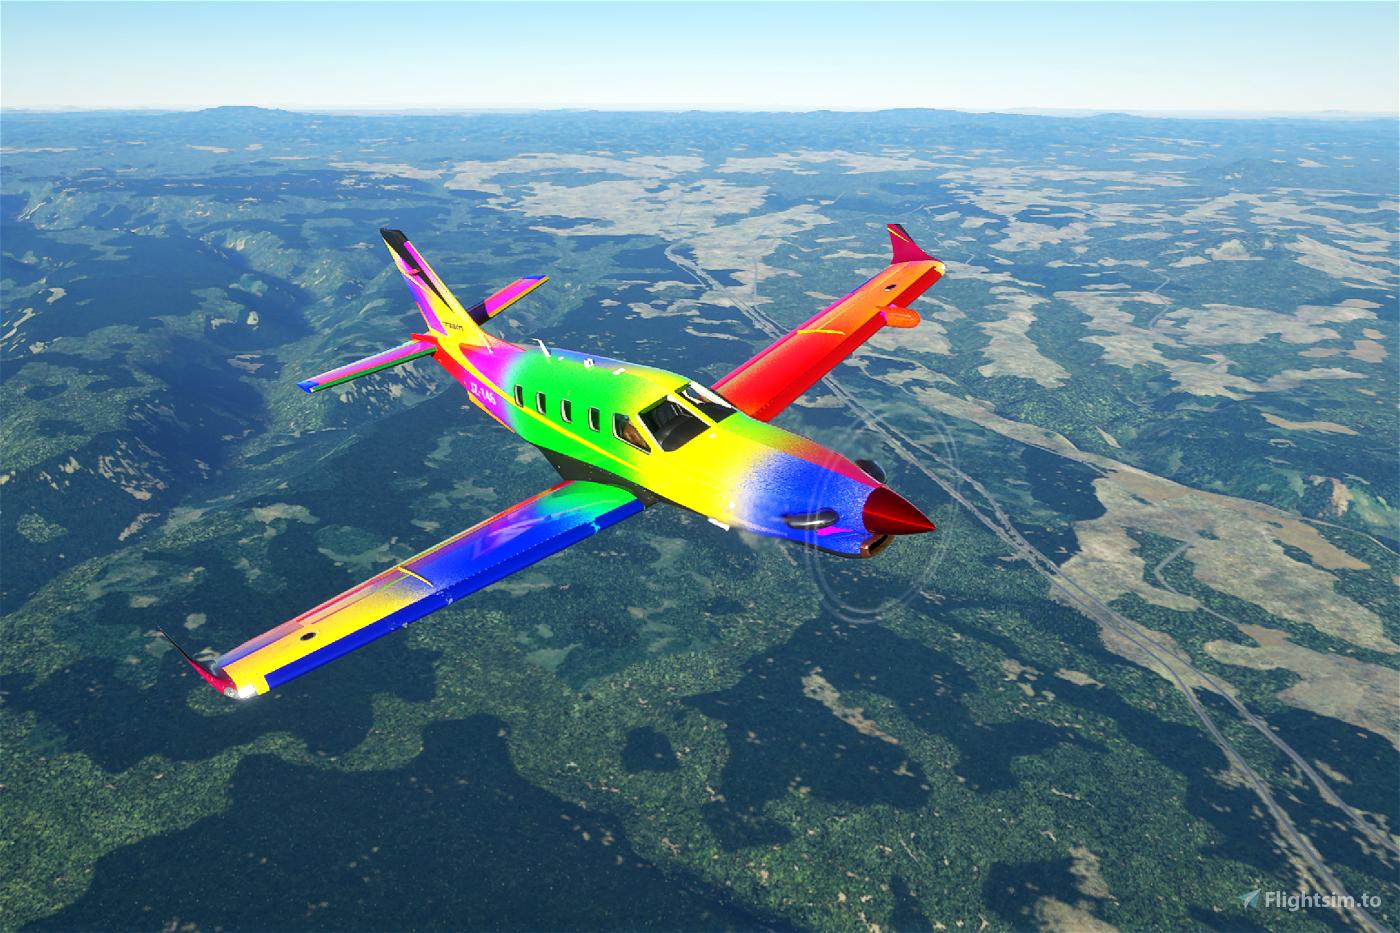 Daher TBM 930